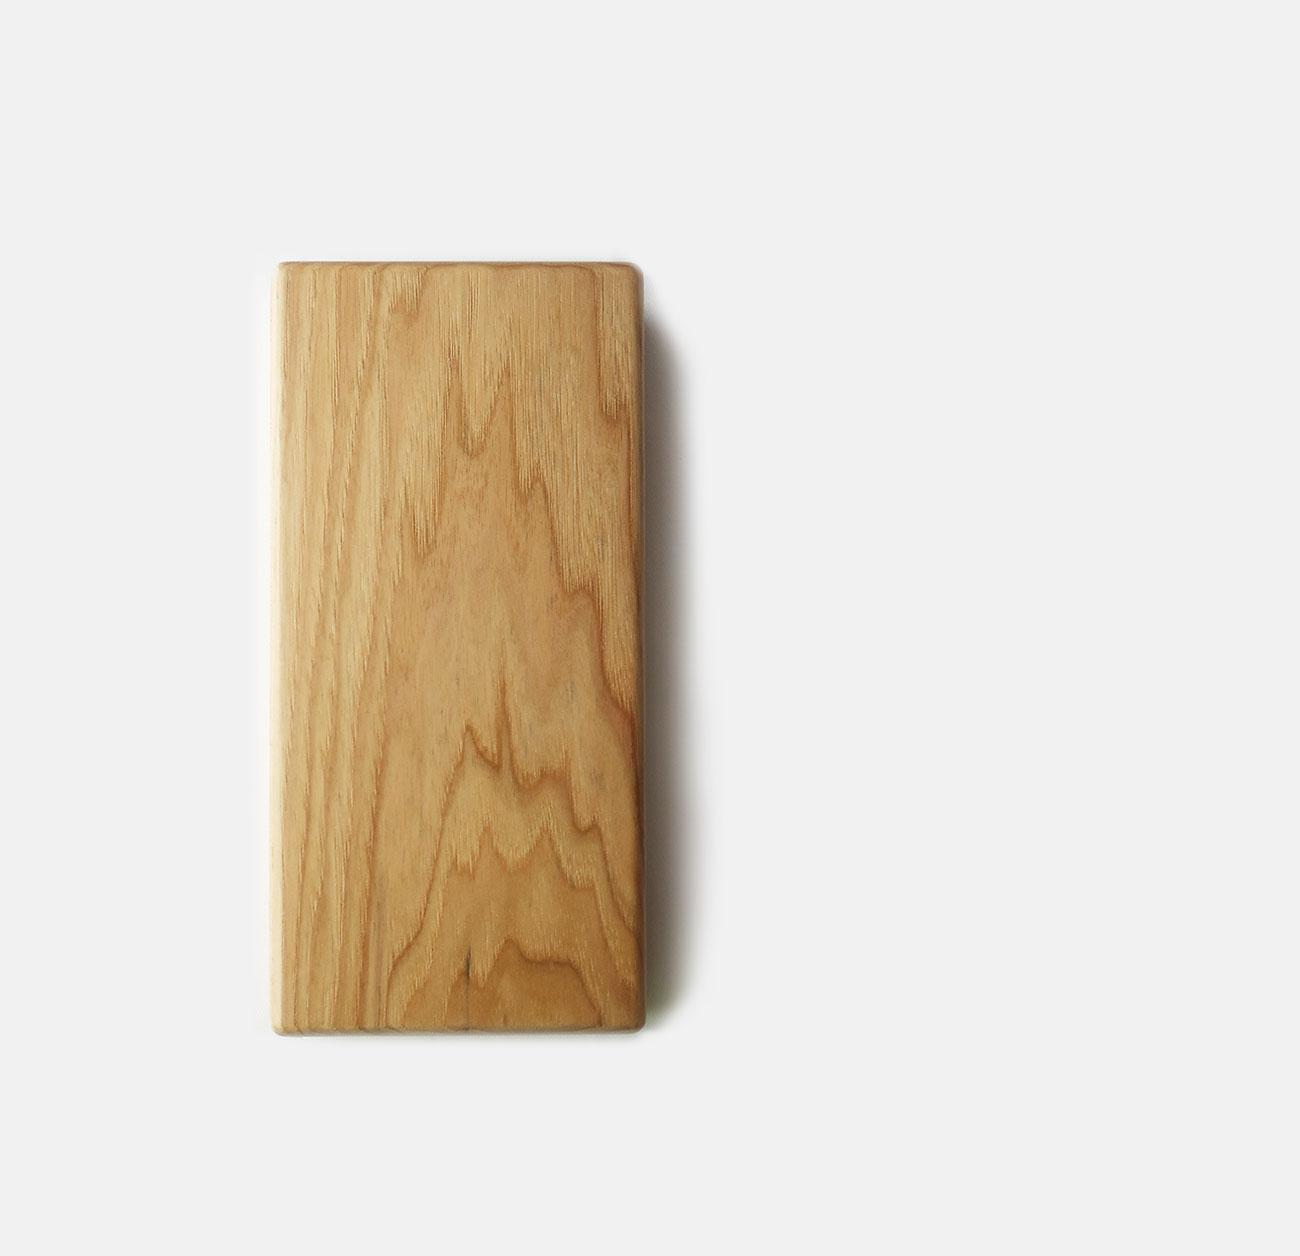 Pecan-wood-block